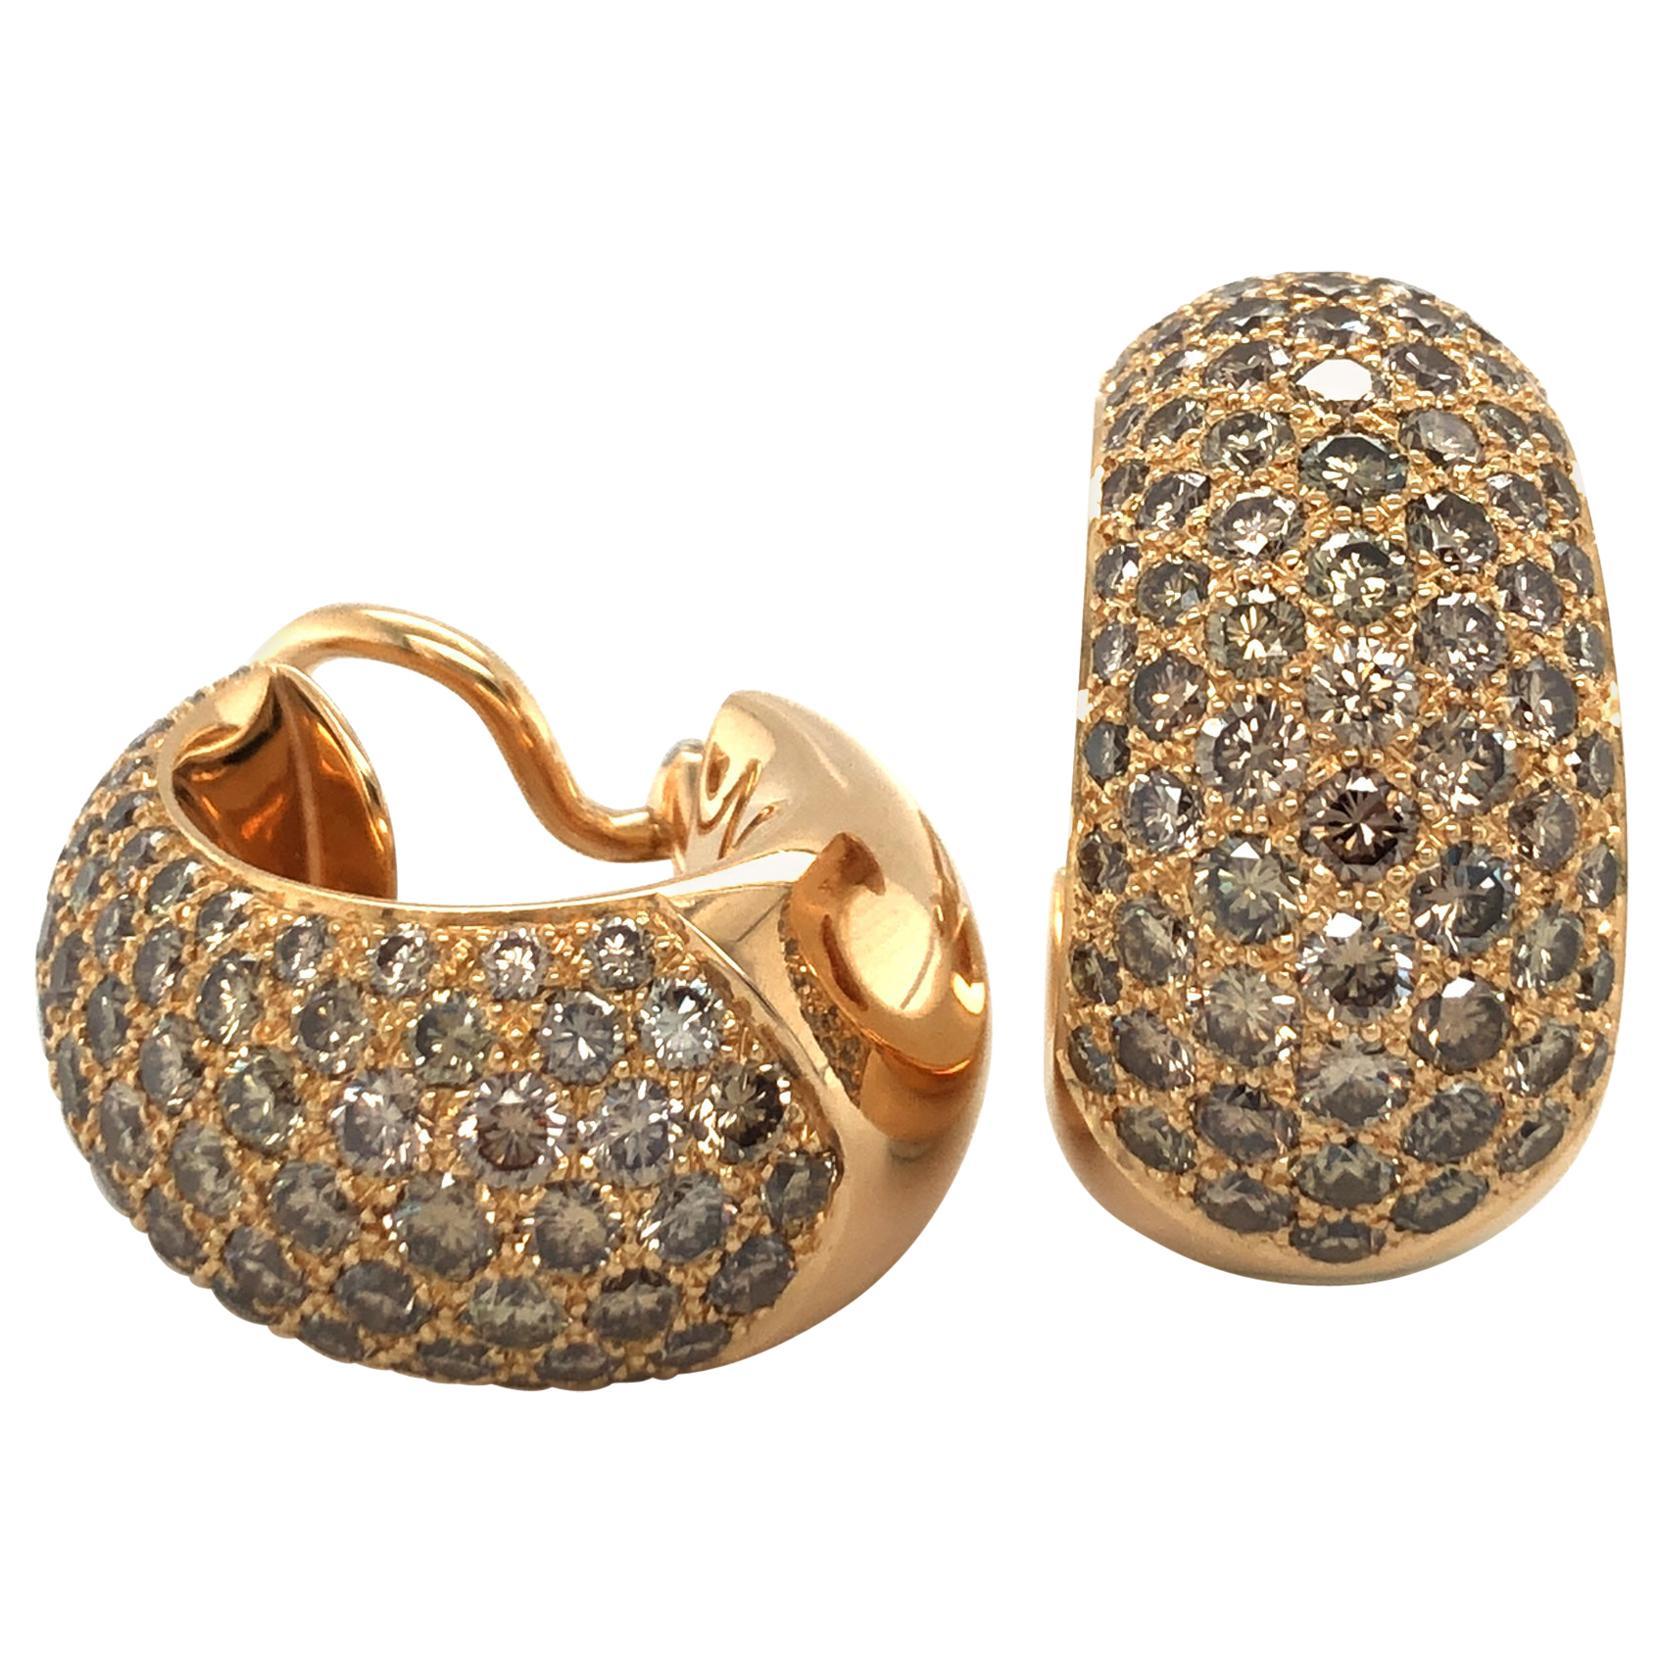 Majo Fruithof Diamond Earclips in 18 Karat Rose Gold